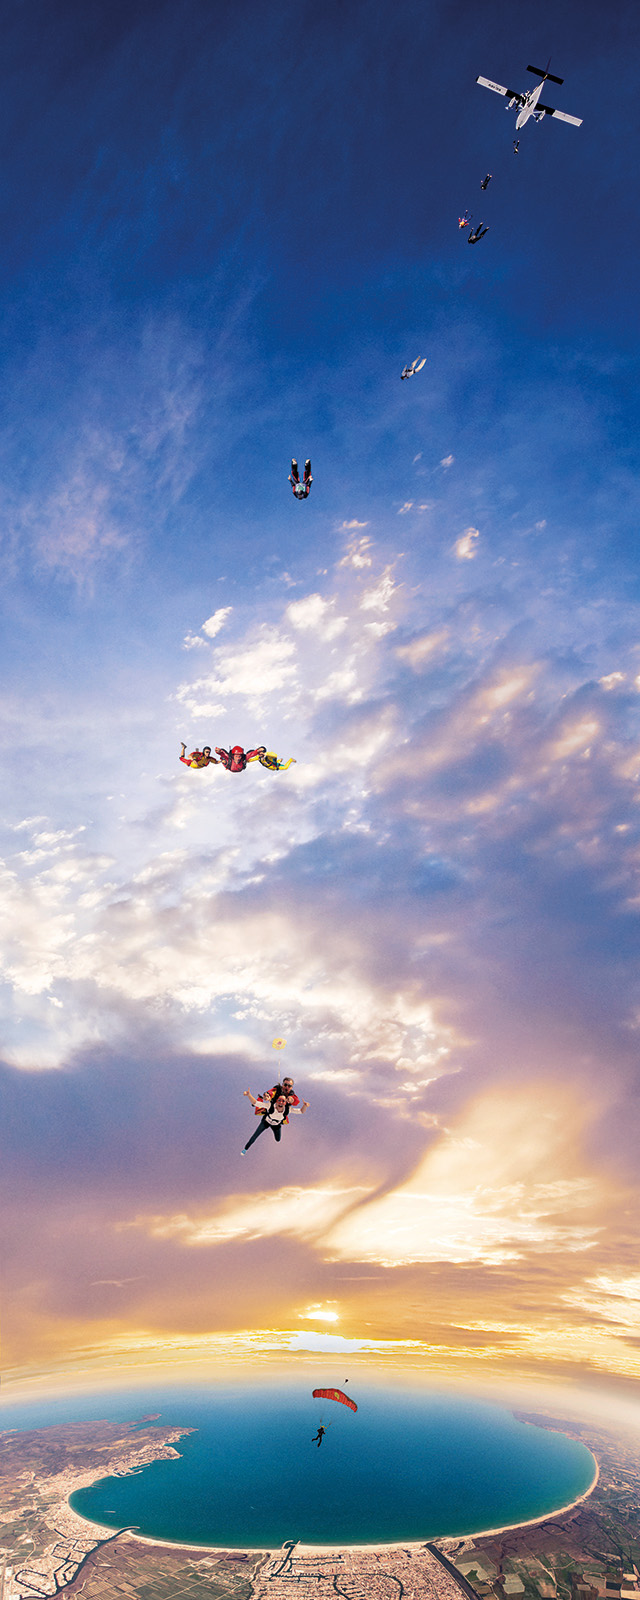 MrJohnSample-Skydive_640x1600